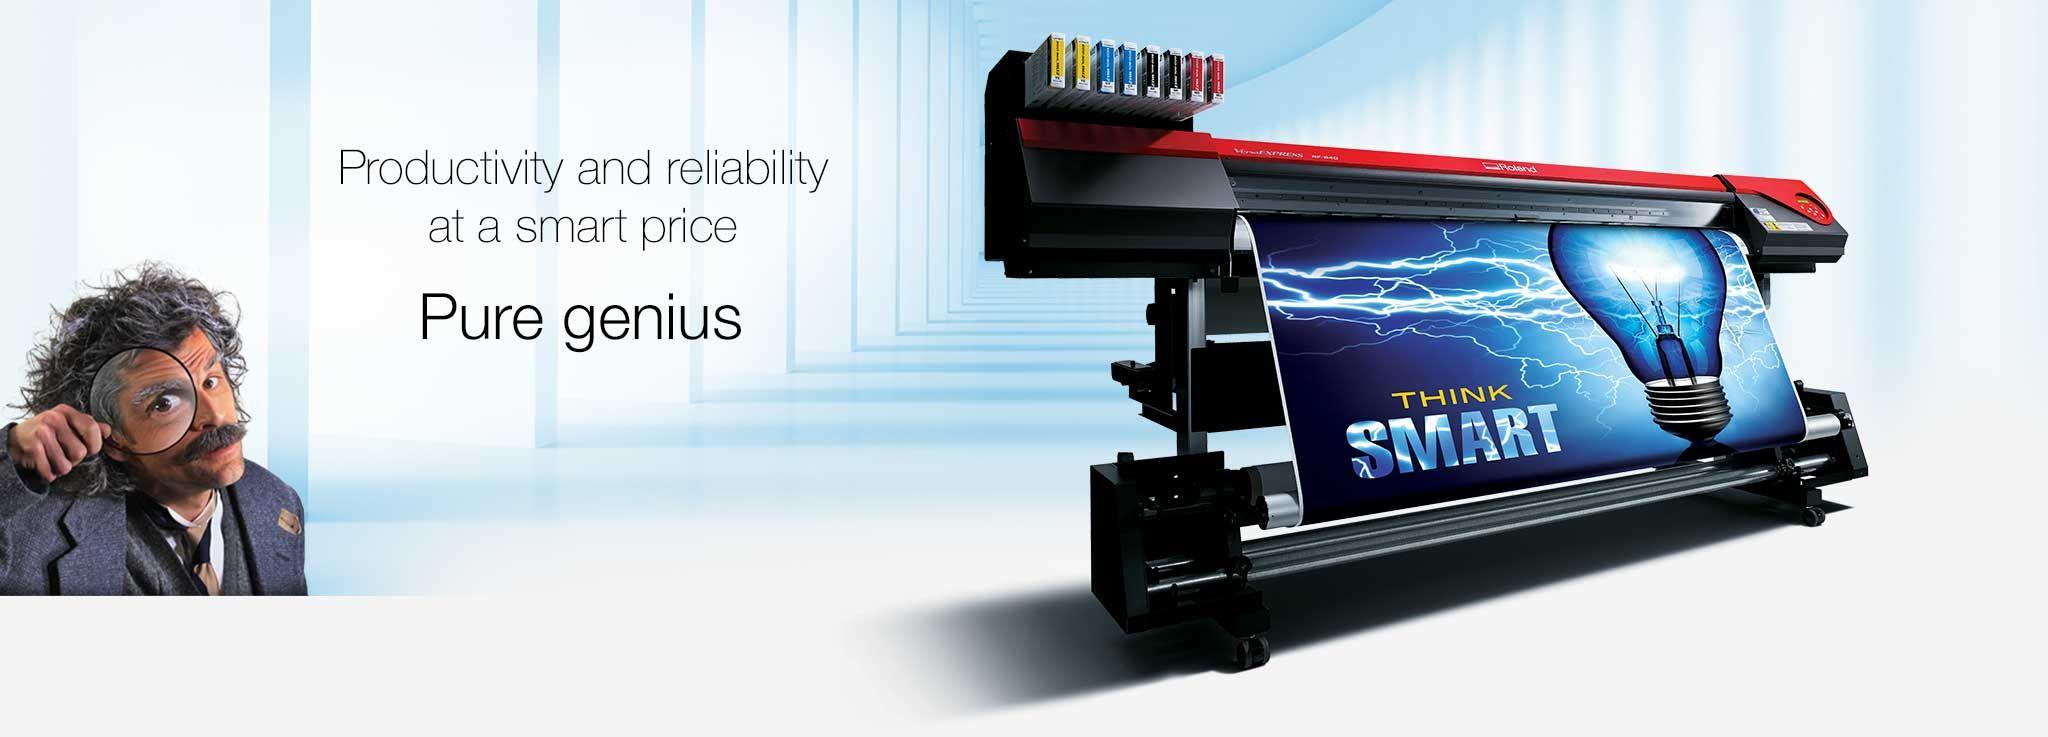 Roland Dg S Ivity At Sign And Digital Uk Large Format Printer Revolution Wide Printers